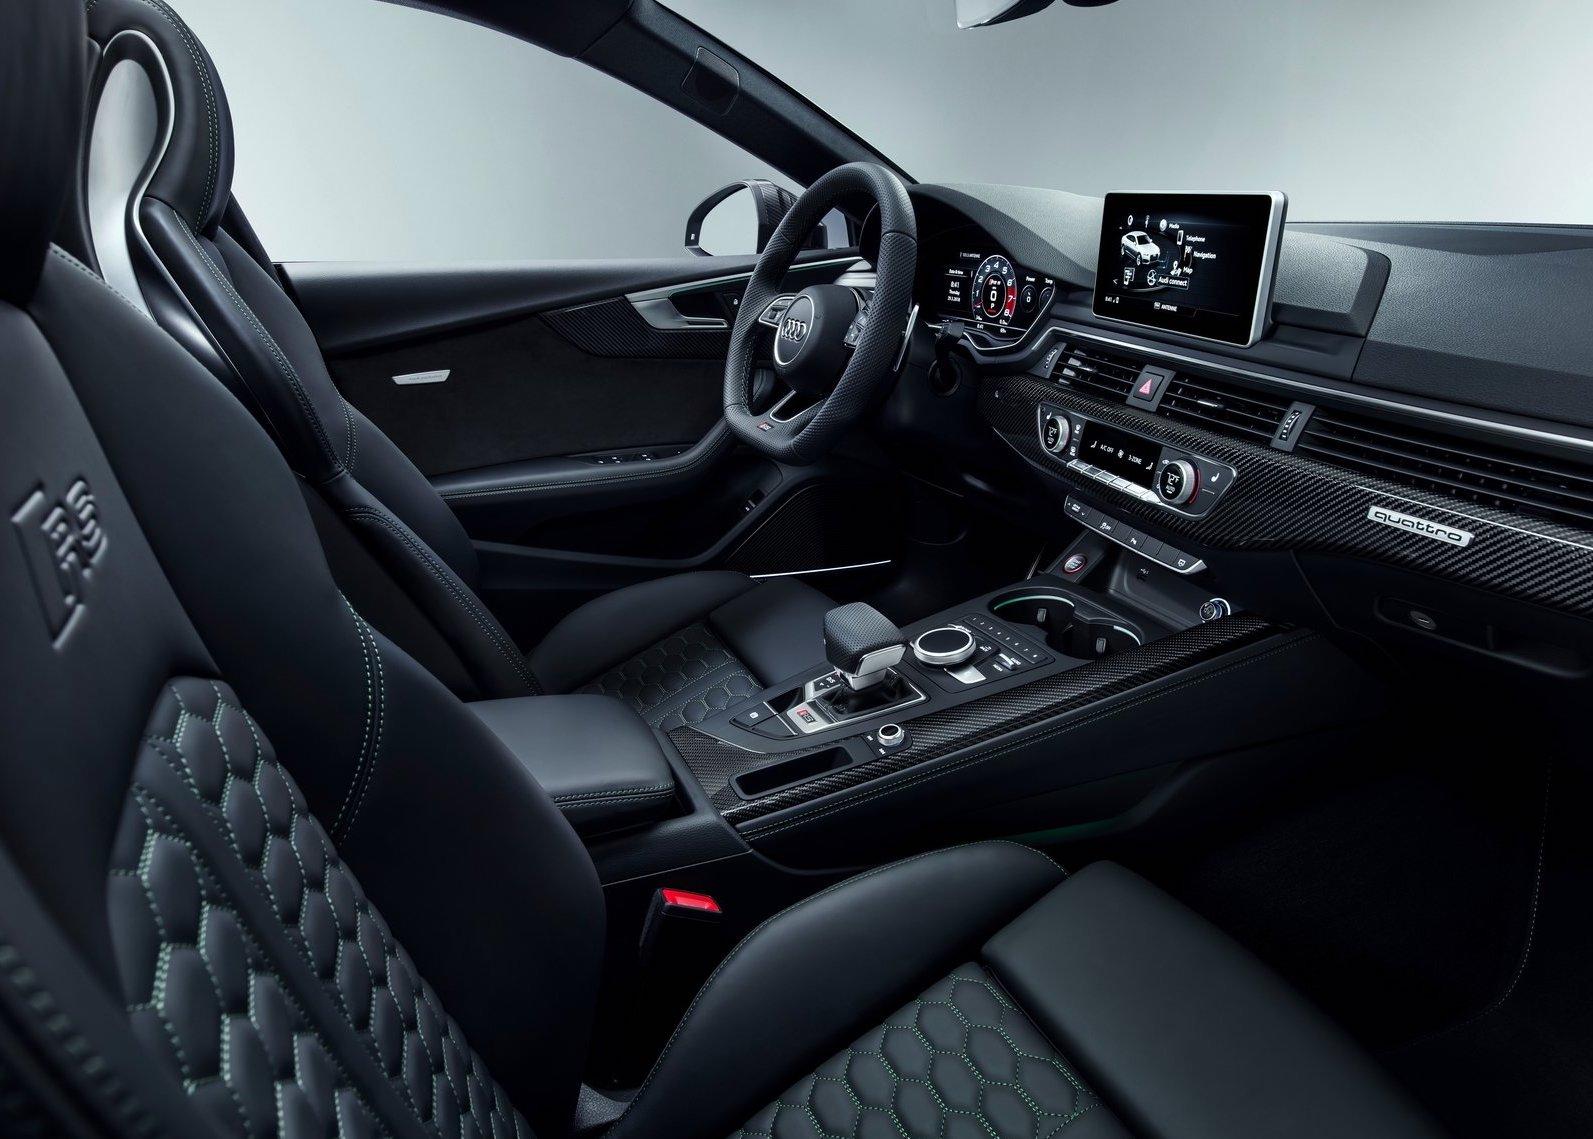 Audi A5 Sportback >> 2019 Audi RS 5 Sportback revealed, first Sportback RS 5 ...